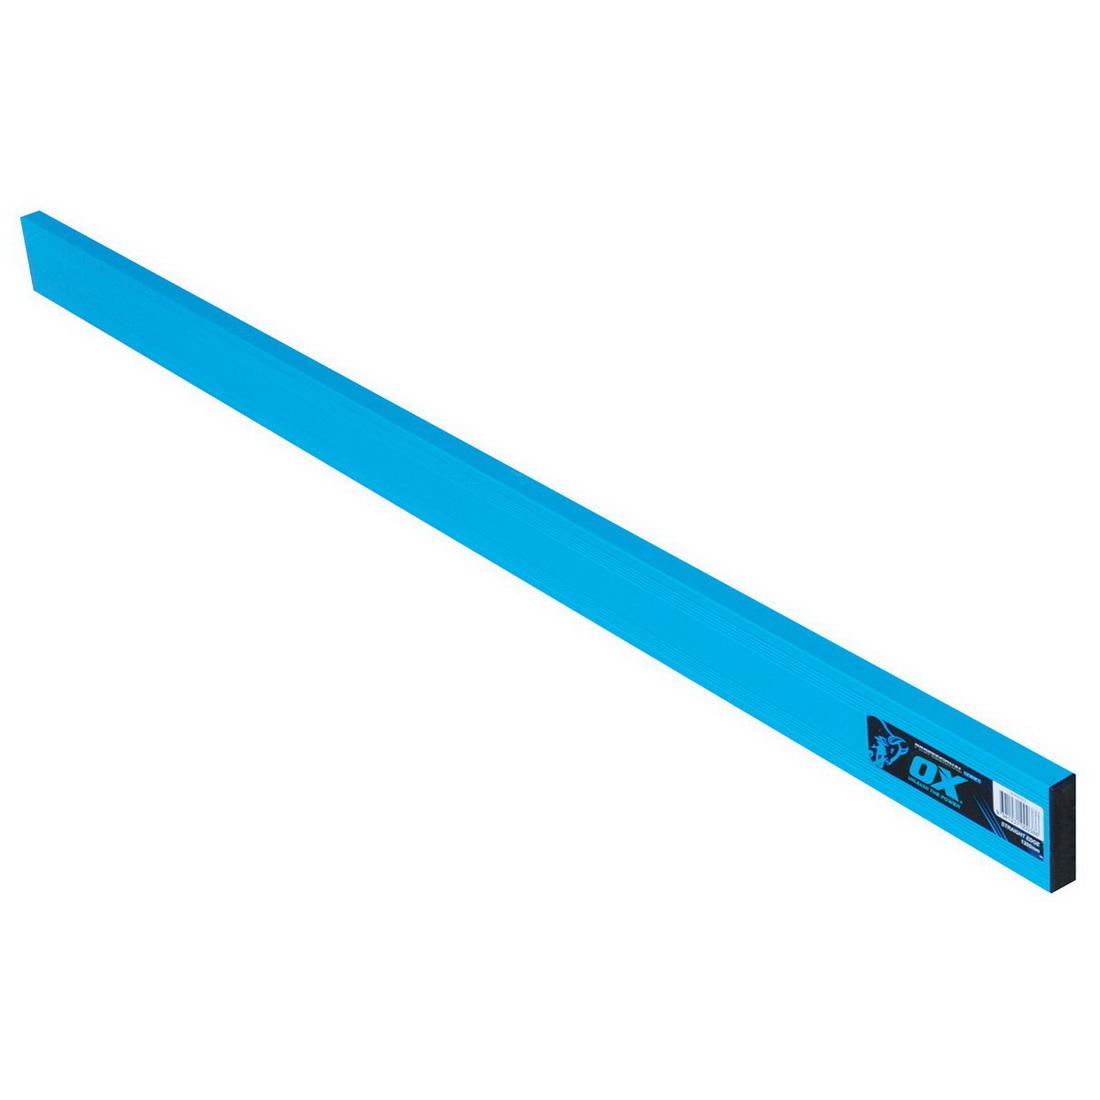 Professional Series Standard Straight Edge 1800mm Aluminium -P021618